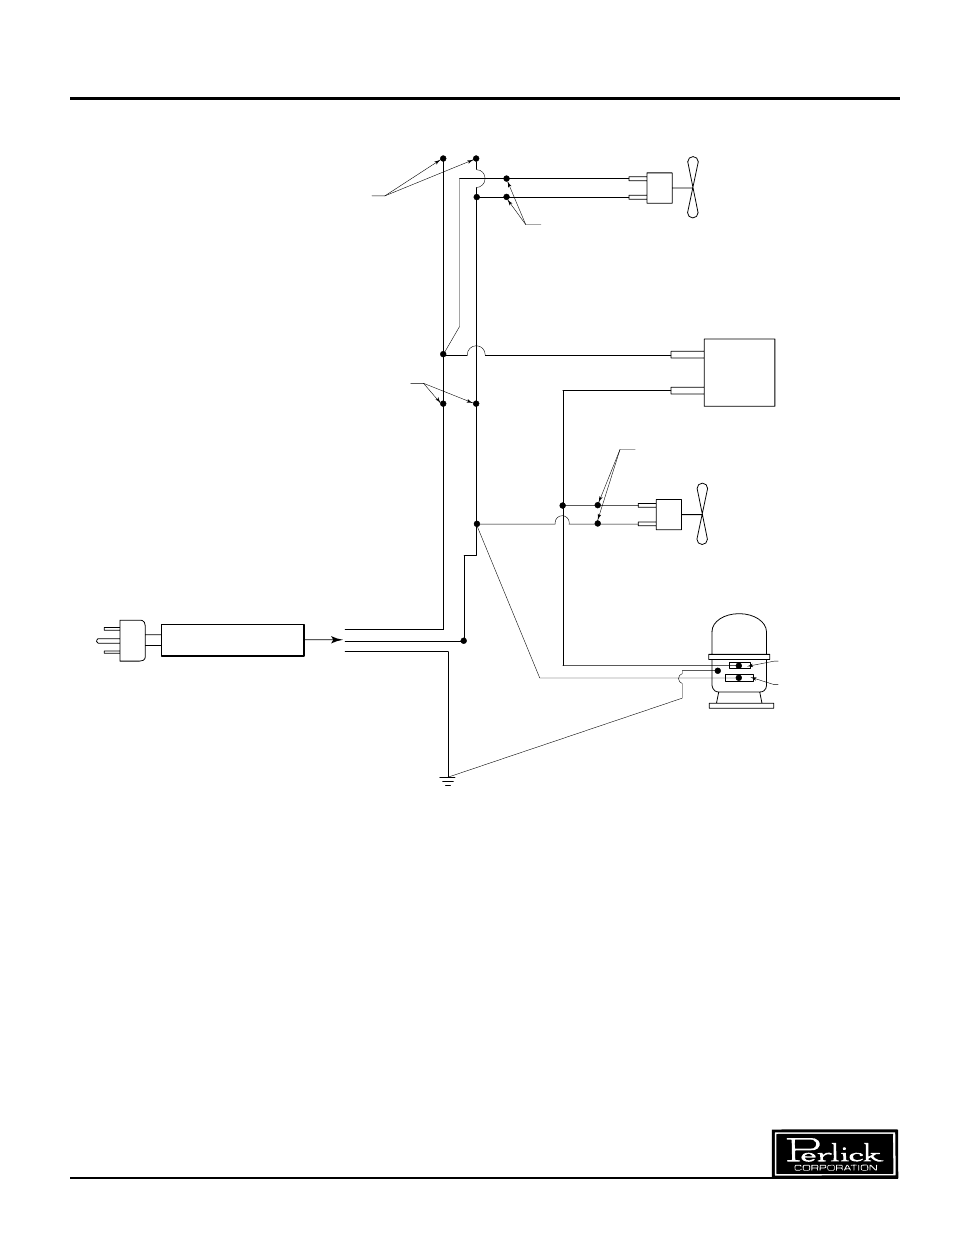 wiring diagram single door refrigerator perlick r24n user manual rh manualsdir com